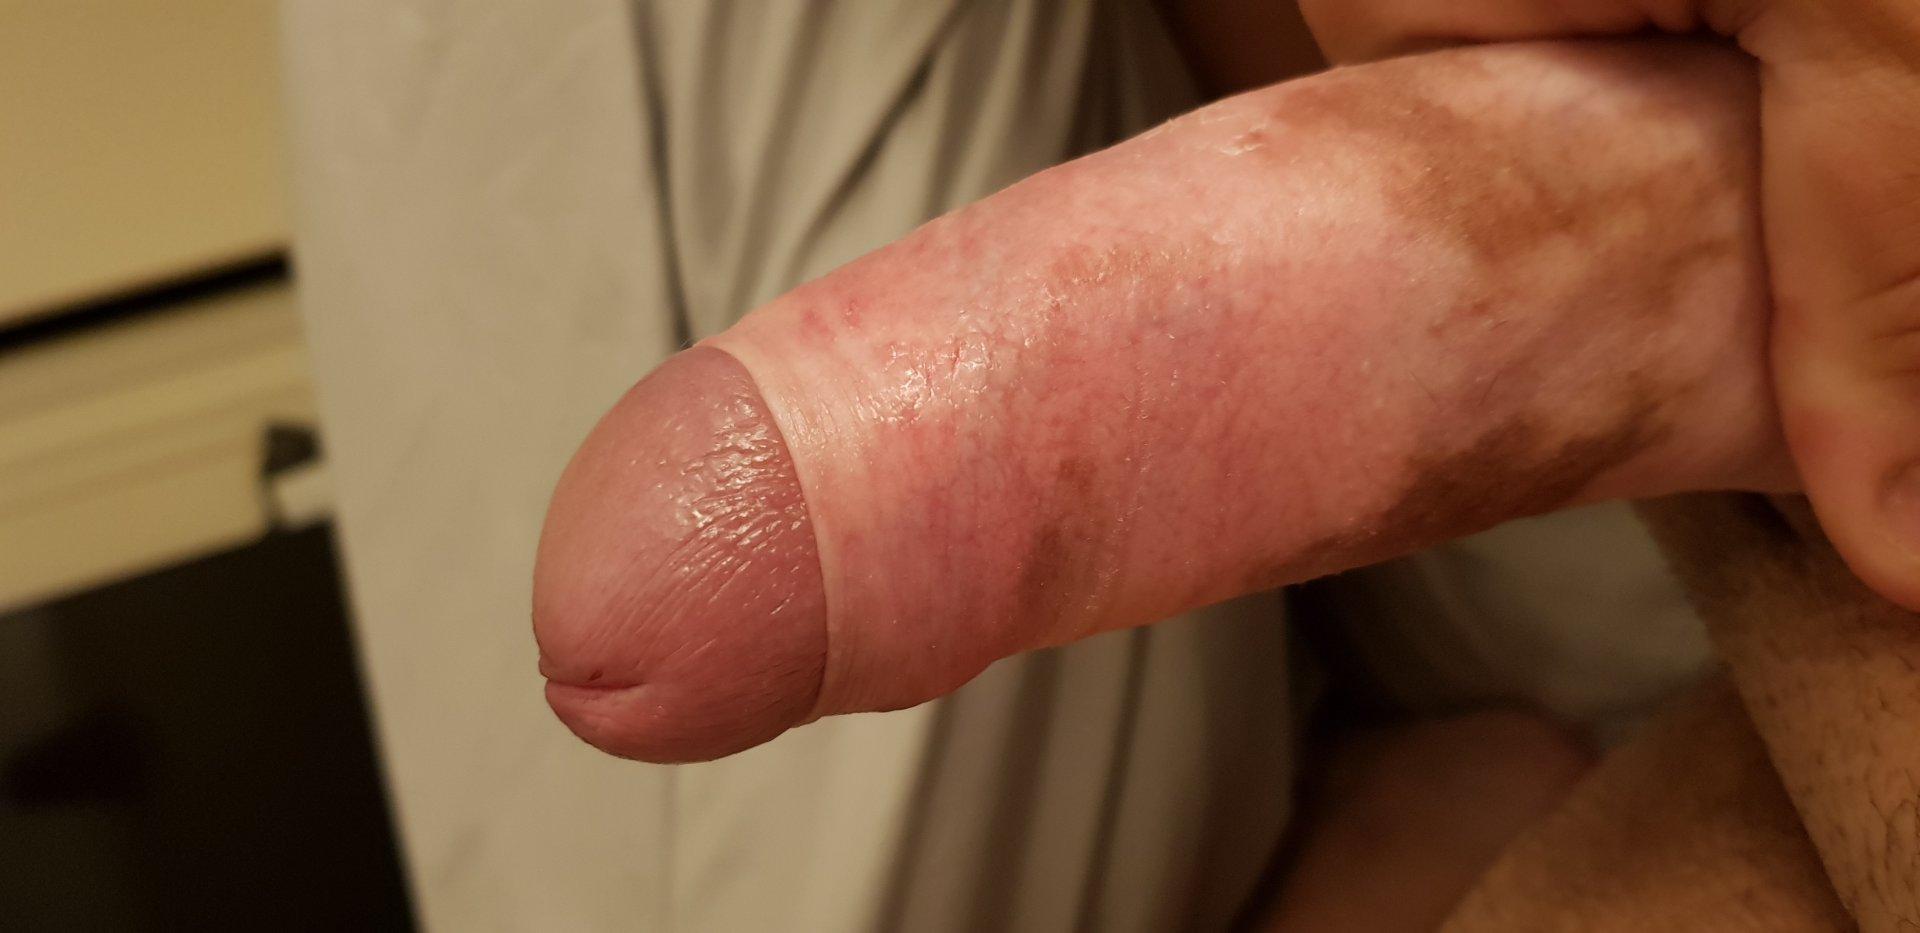 Petegr from Victoria,Australia